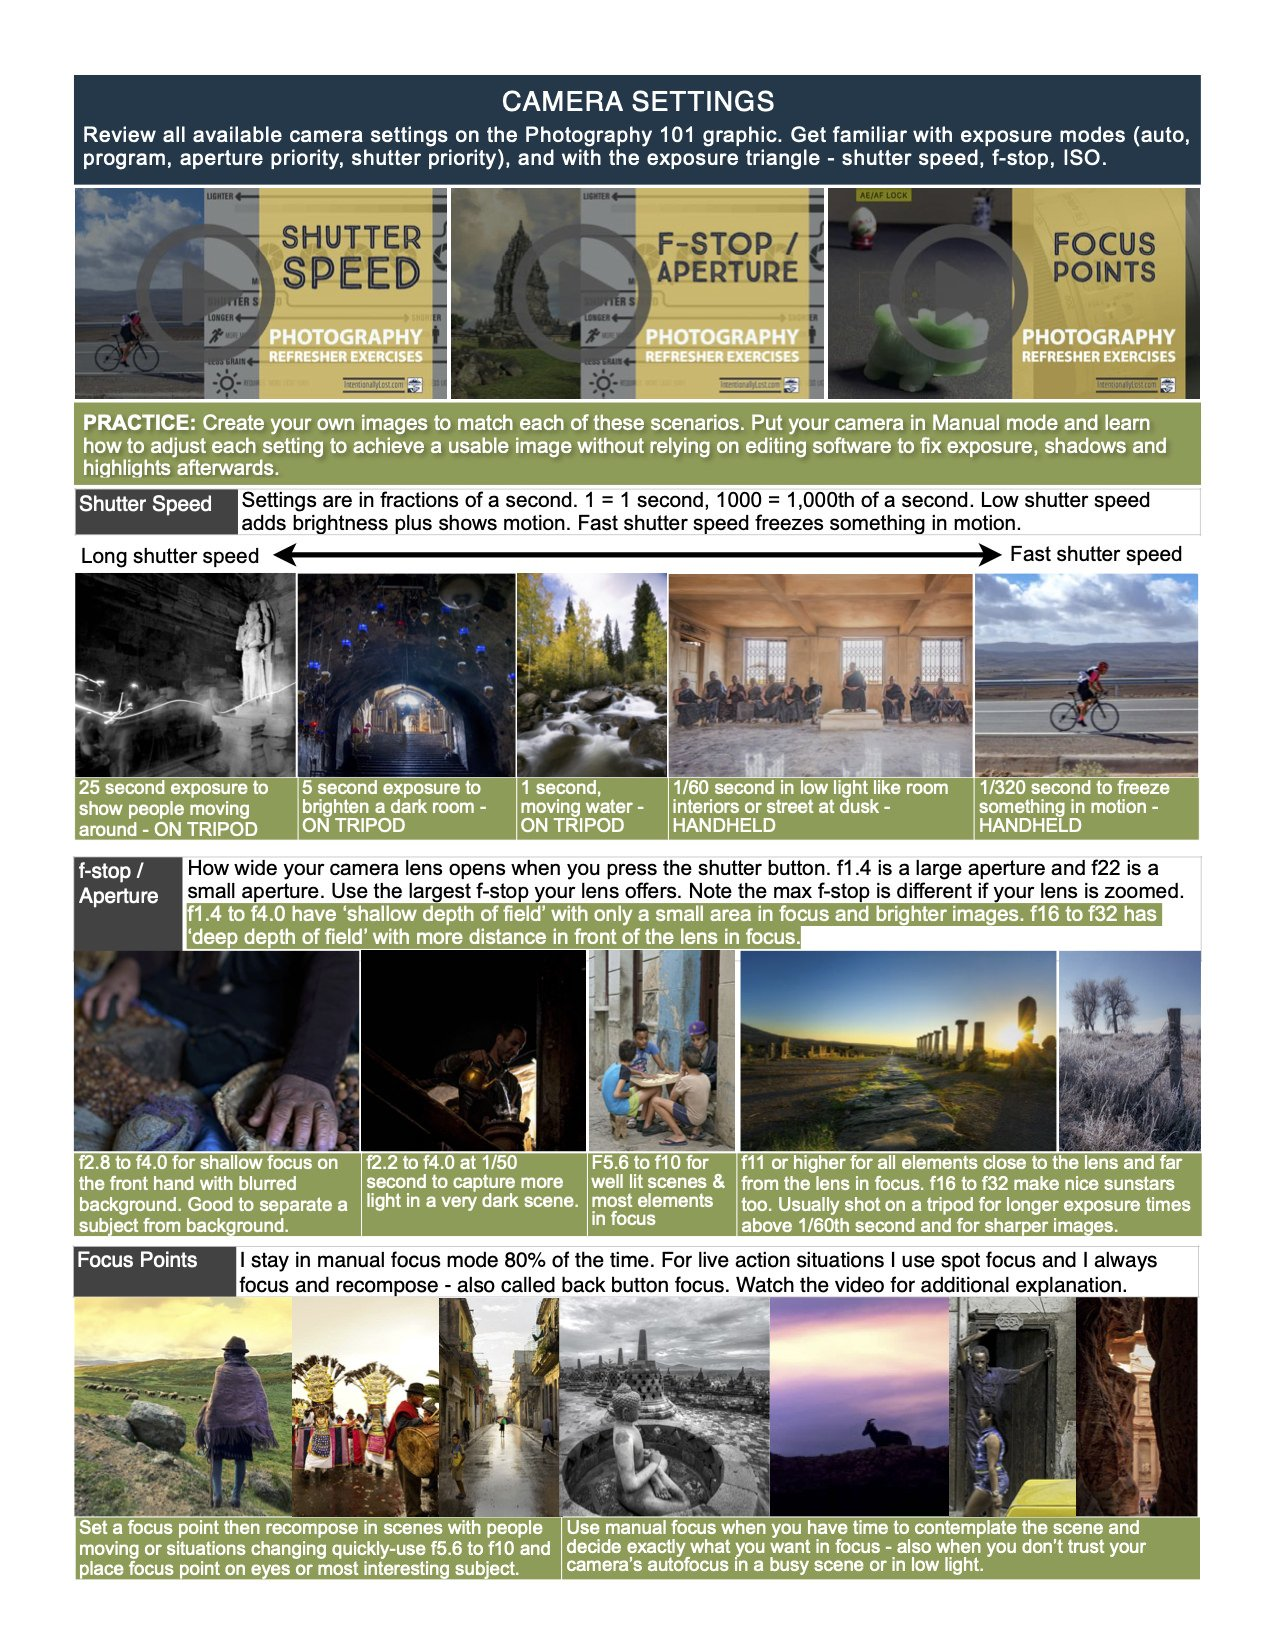 Learn Photography - camera skills, situational skills, photo principles